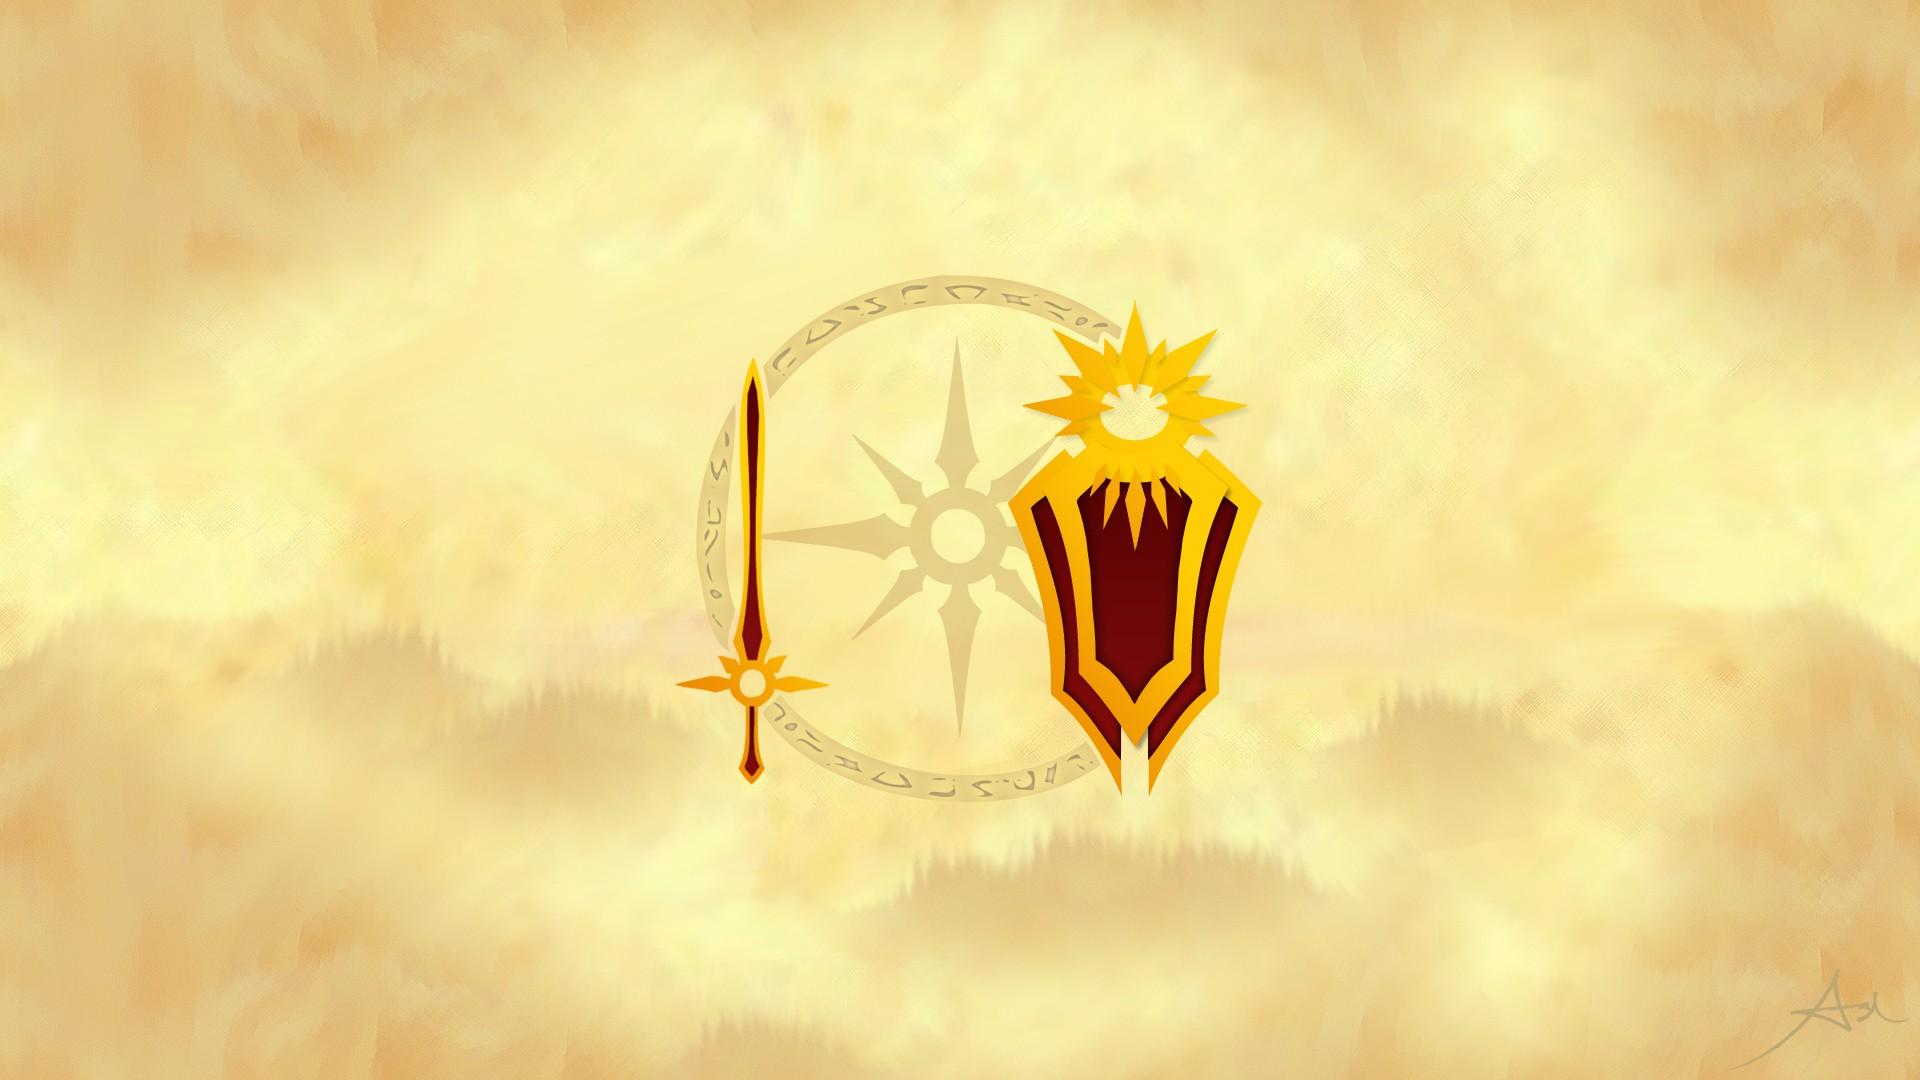 Video Games Sun League Of Legends Fantasy Art Leona Zenith